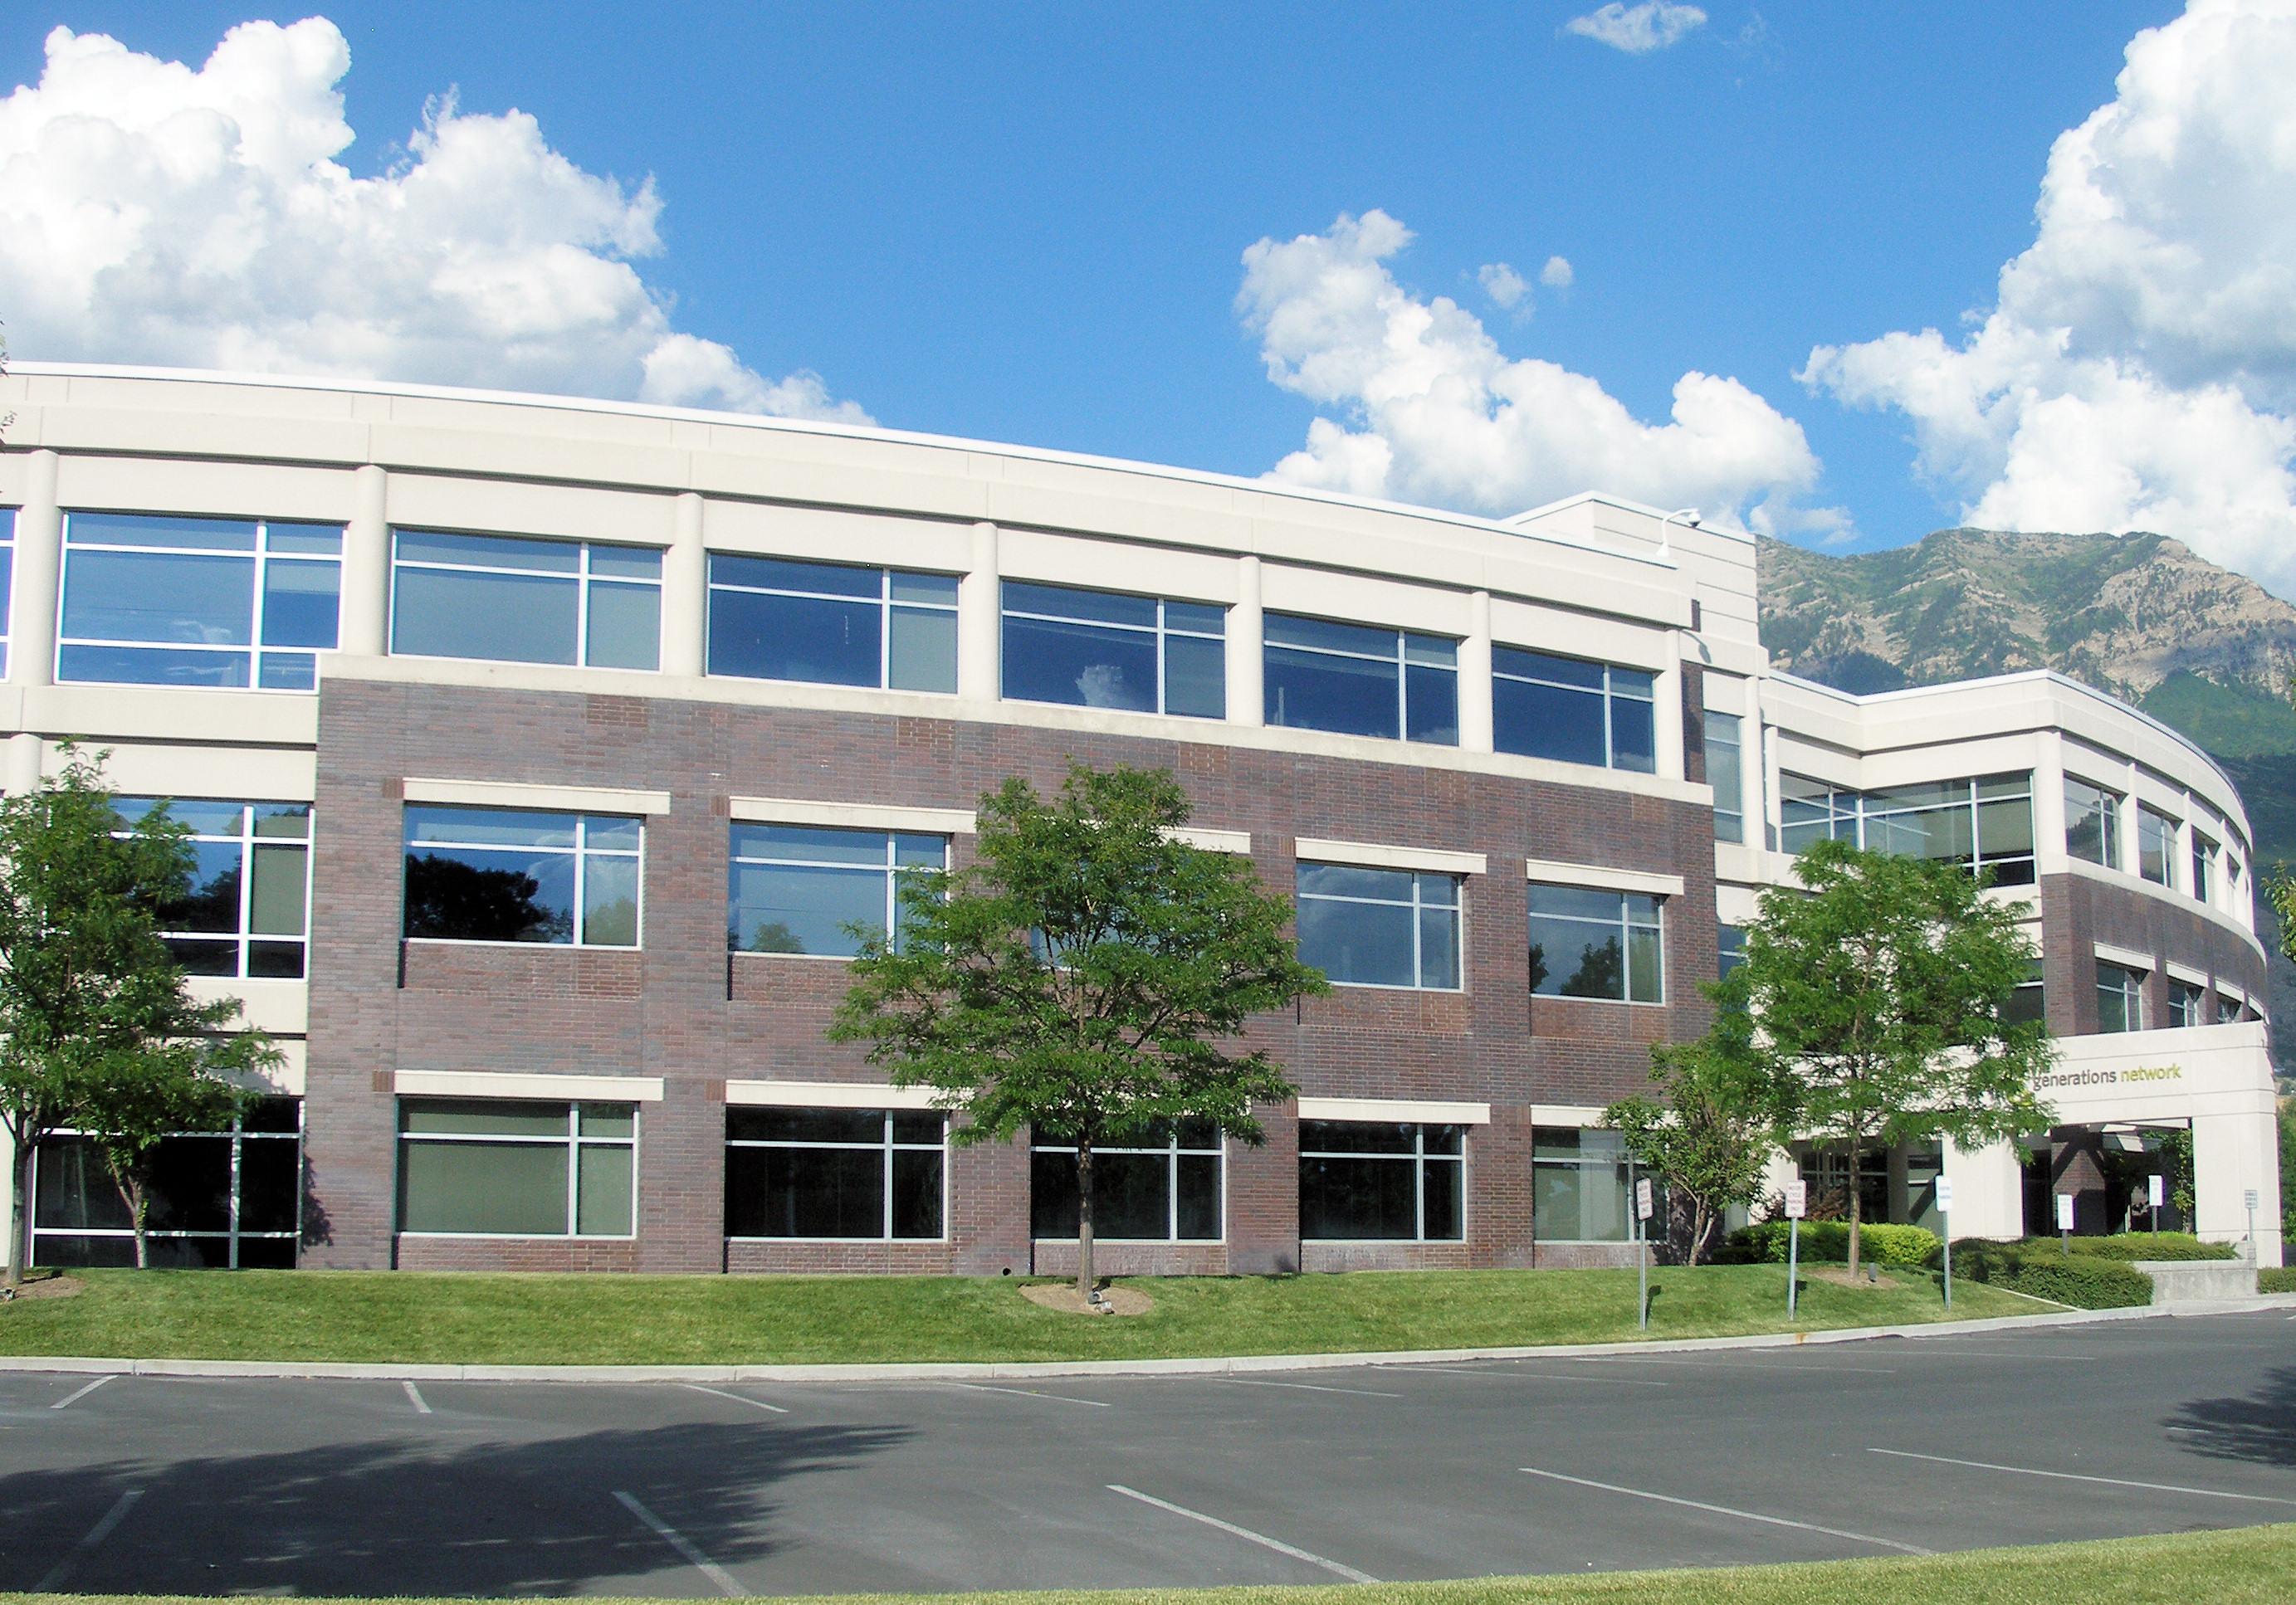 Bank of americas headquarters in charlotte, north carolina